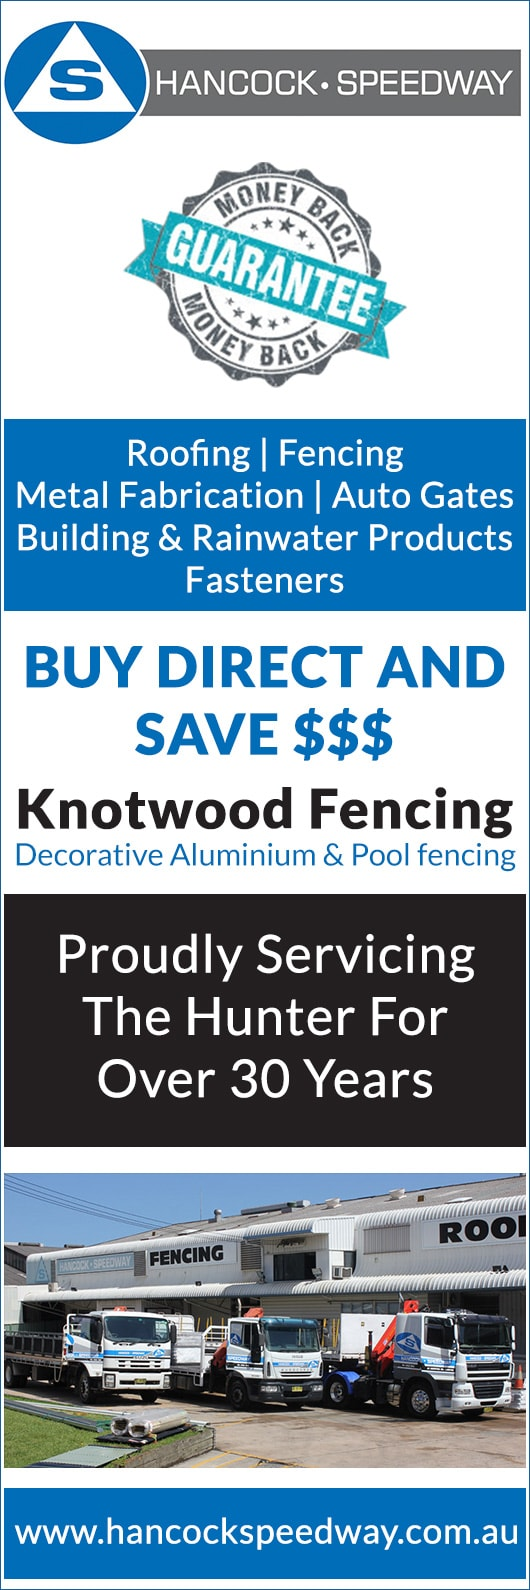 Hancock Sheetmetal Pty Ltd Fencing Materials Newcastle